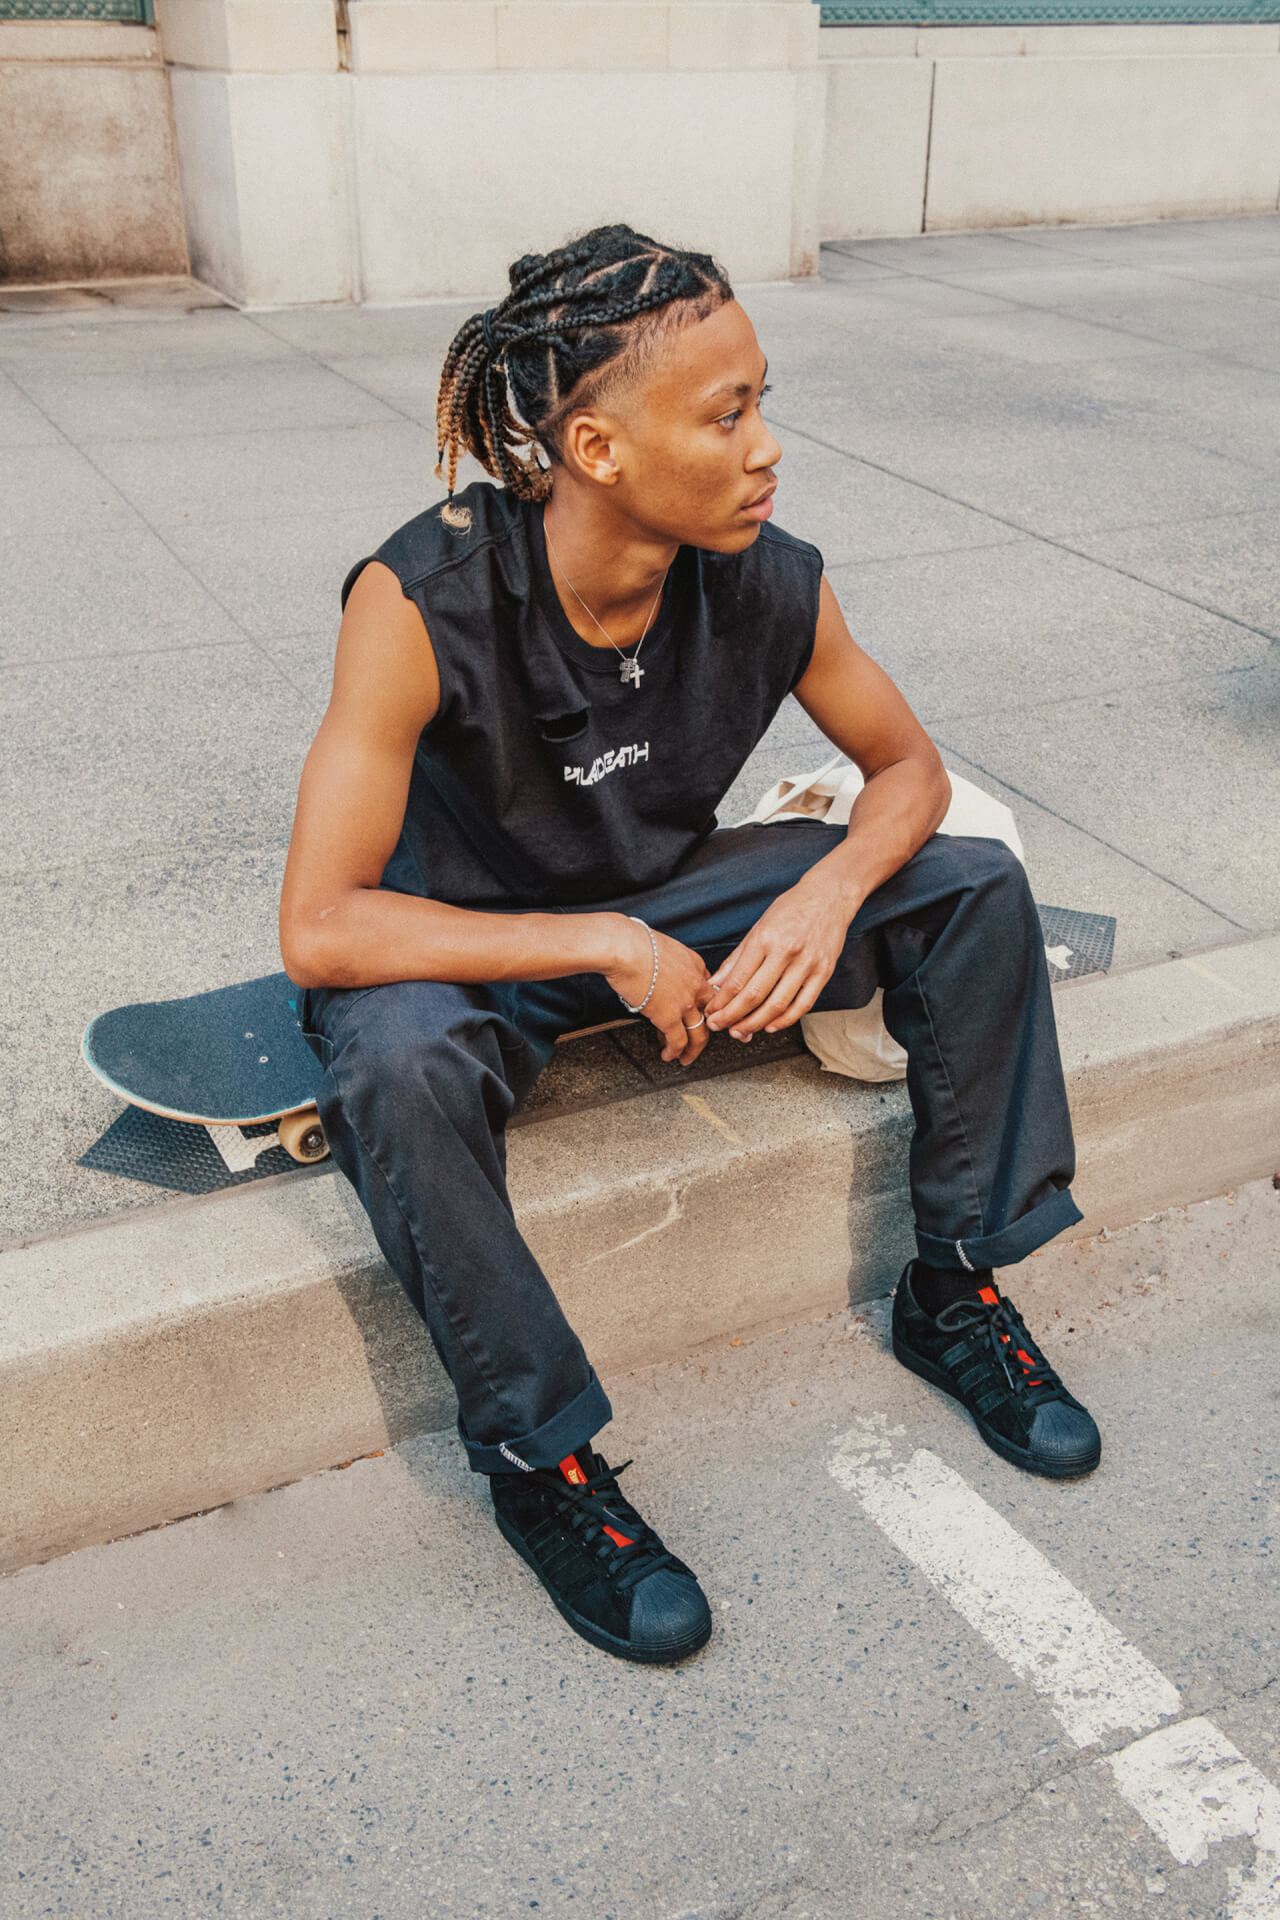 adidas SkateboardingとTHRASHERがコラボ!プロスケーターTyshawn Jonesのシグネチャーモデル&新型SUPERSTARが登場 life201126_adidas_skateboarding_12